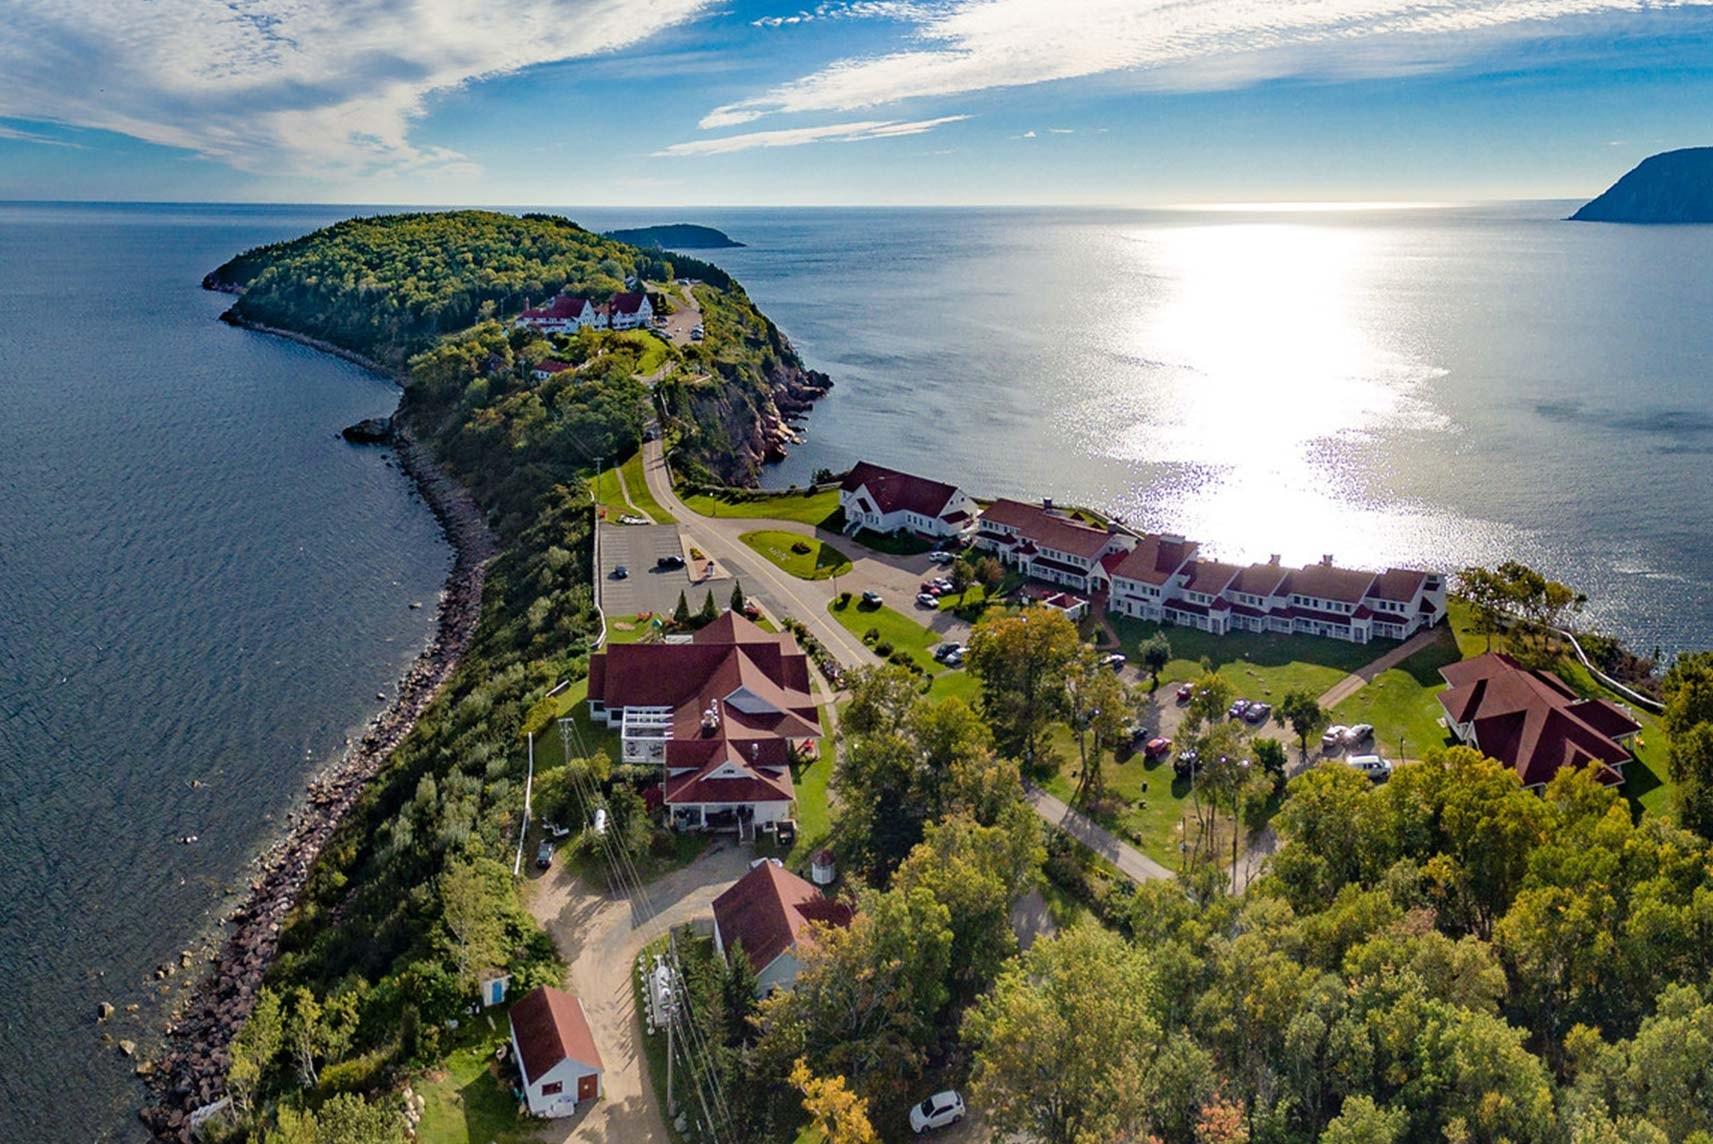 15 Tage Traumhaftes Atlantik Kanada mit gehobenen Hotels